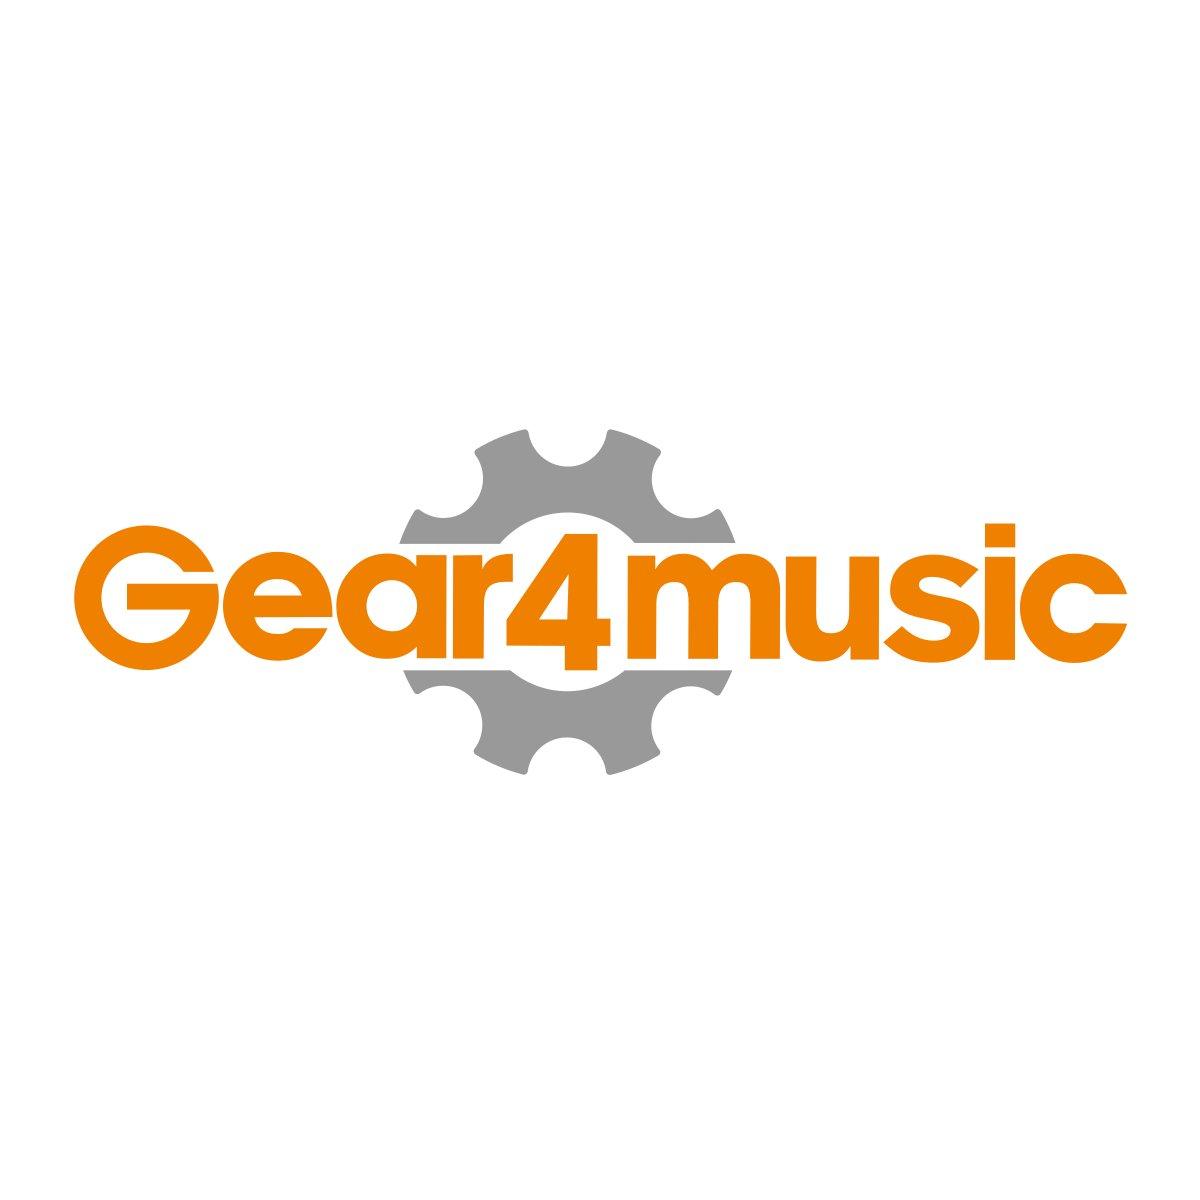 behringer xenyx 302usb usb analog mixer at gear4music. Black Bedroom Furniture Sets. Home Design Ideas